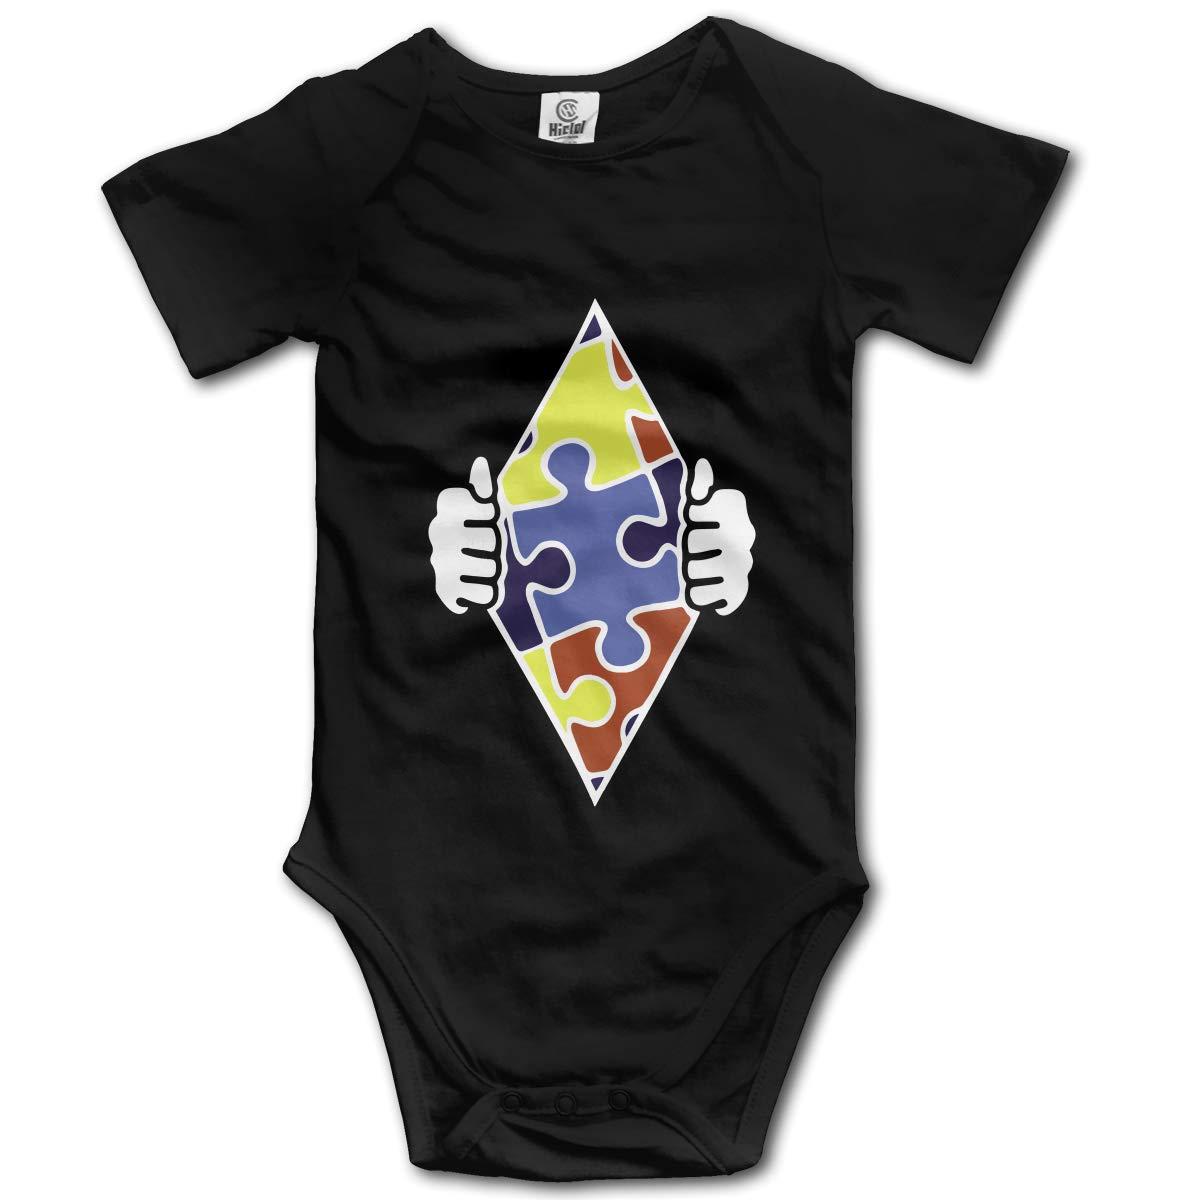 XHX Newborn Babys Autism Superhero Short Sleeve Romper Onesie Bodysuit Jumpsuit